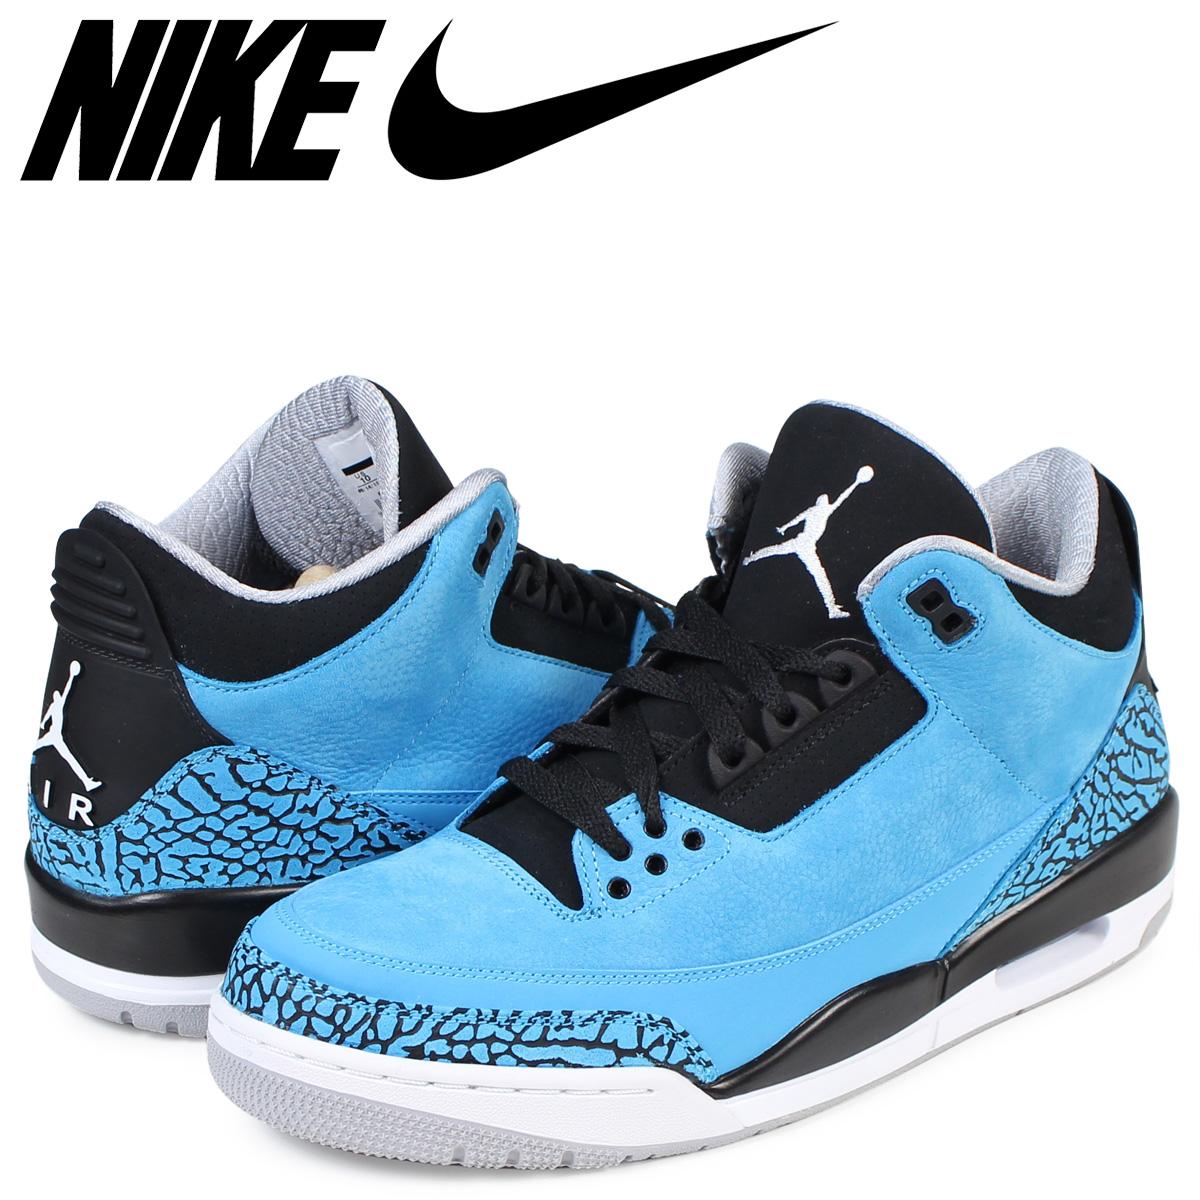 594a691a38e751 ... order nike air jordan 3 retro nike air jordan 3 nostalgic sneakers  136064 406 mens blue